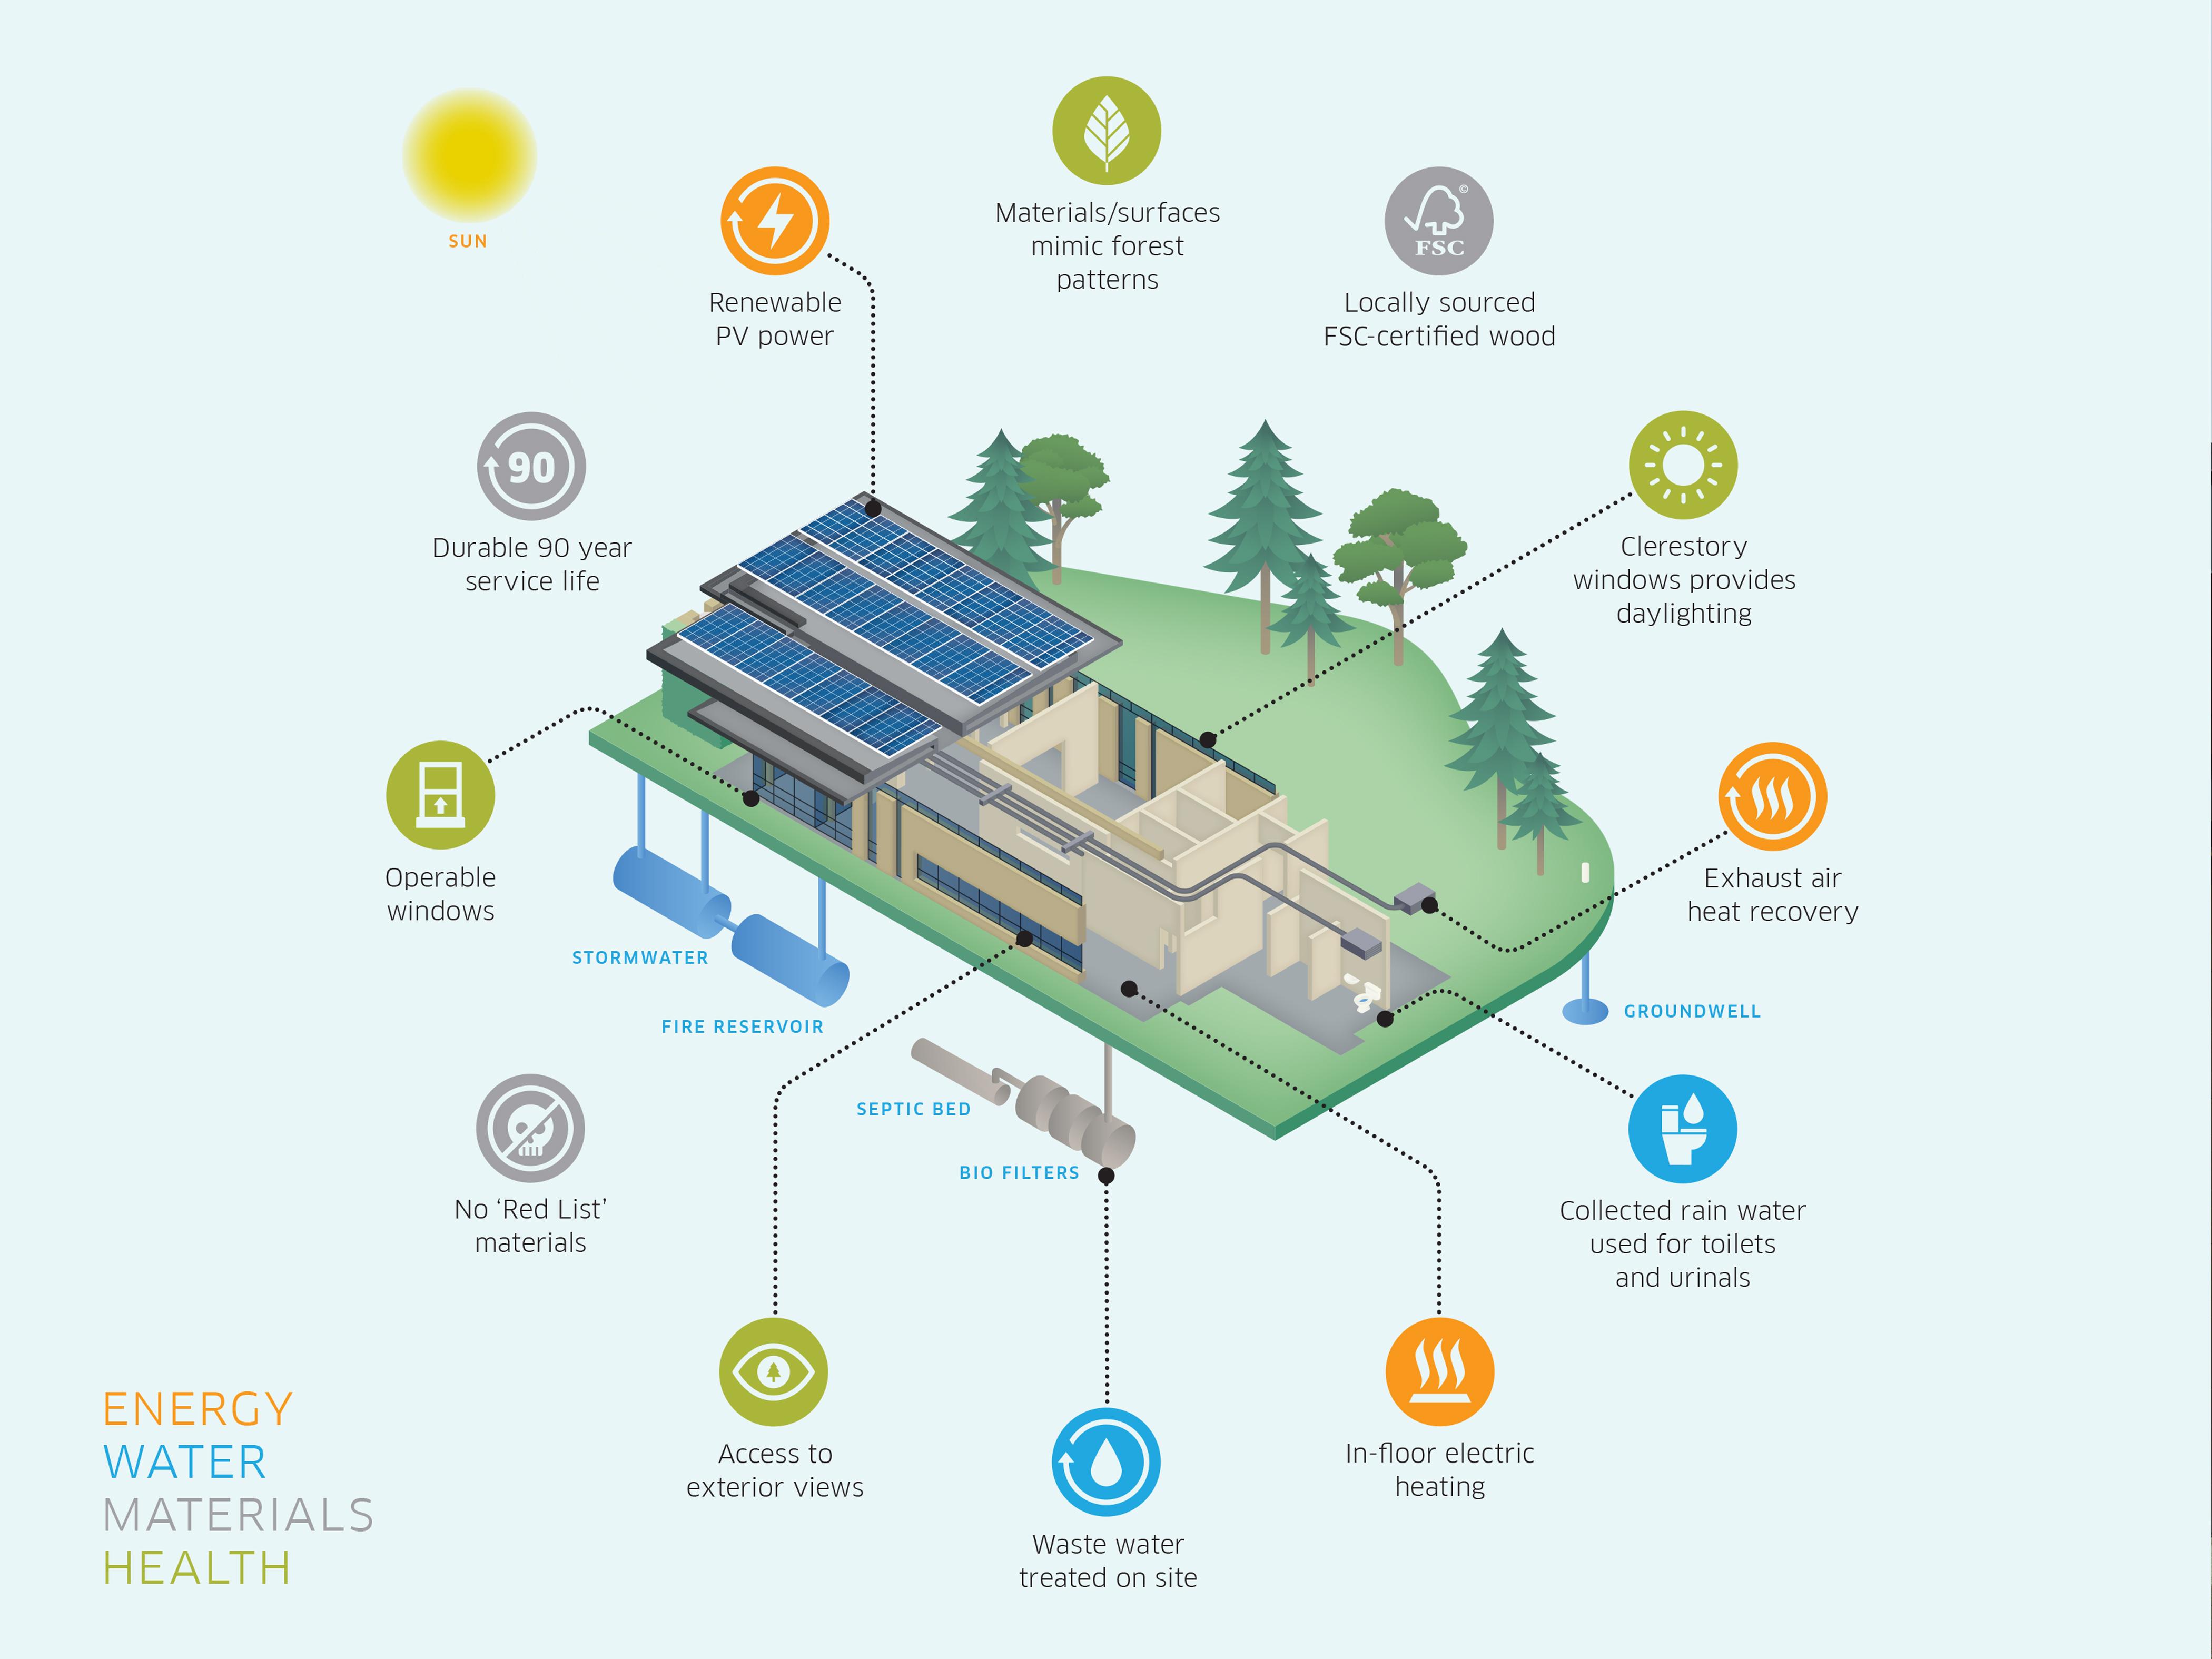 15BFFSEC Sustainability Diagram Credit Norman Studio for DIALOG